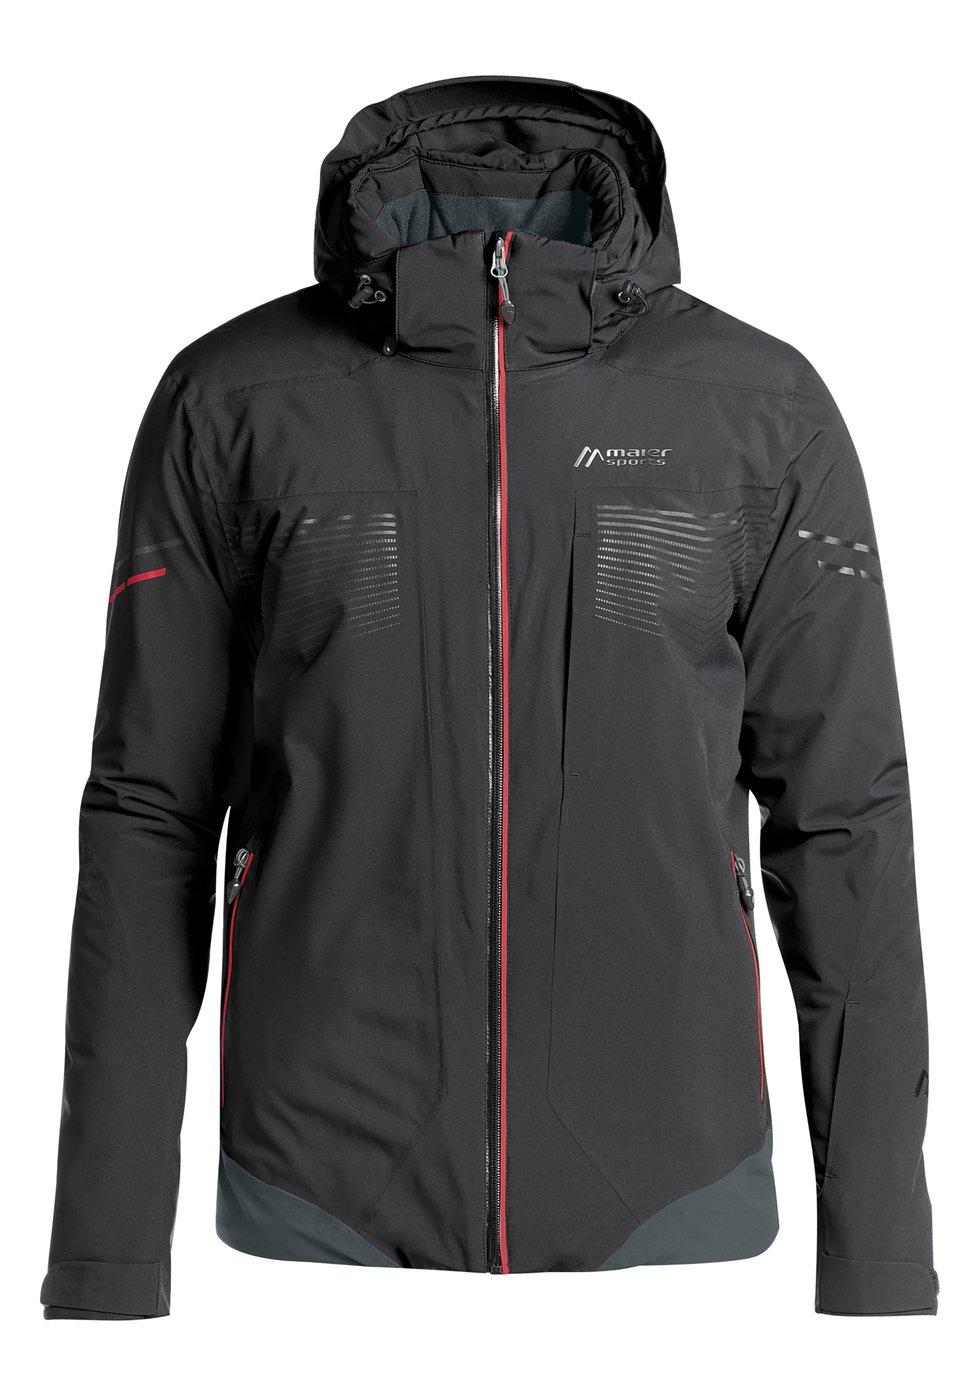 Maier Sports Pralongia Mens Ski Jacket 2019 BlackSalsa